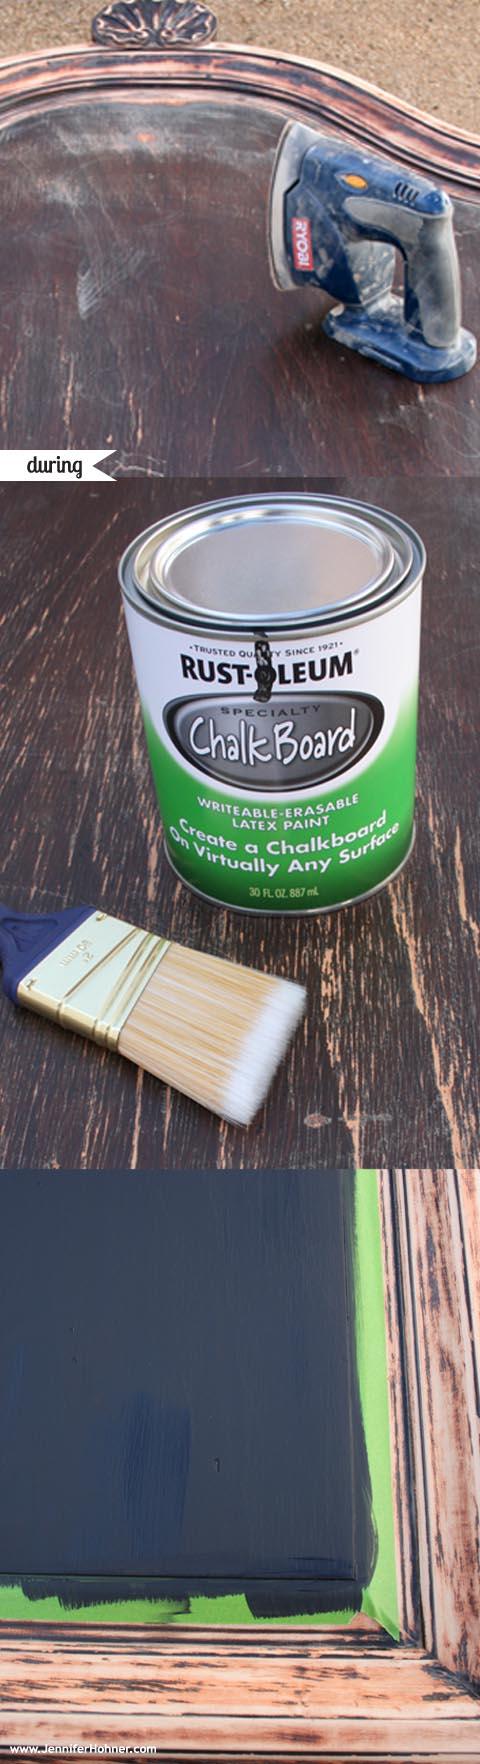 DIY_Chalkboard_during